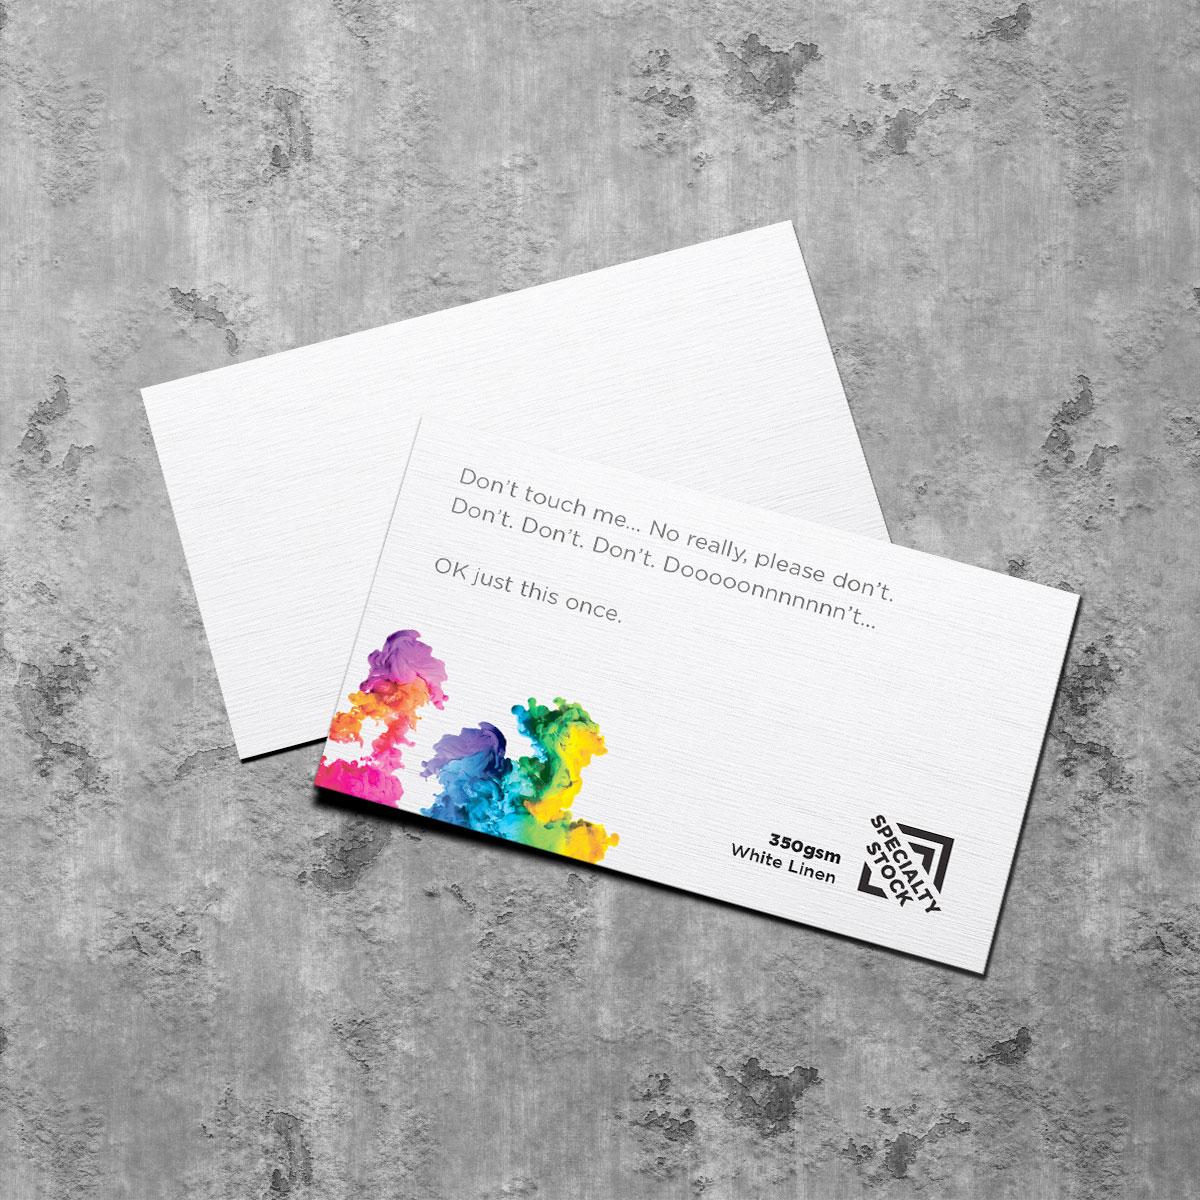 350gsm linen textured white business card